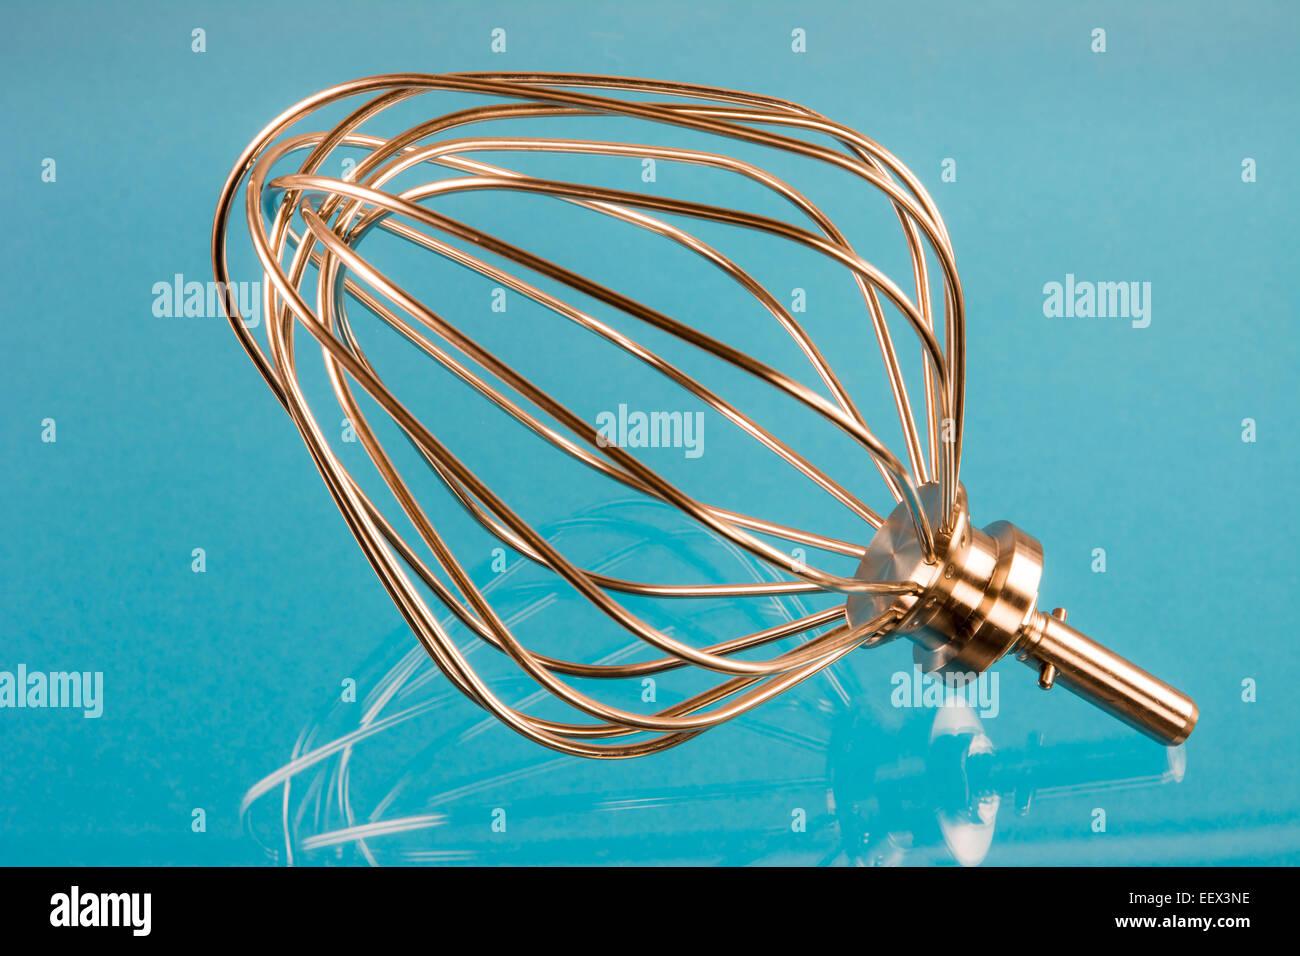 Machine Whisk Stock Photos & Machine Whisk Stock Images - Alamy